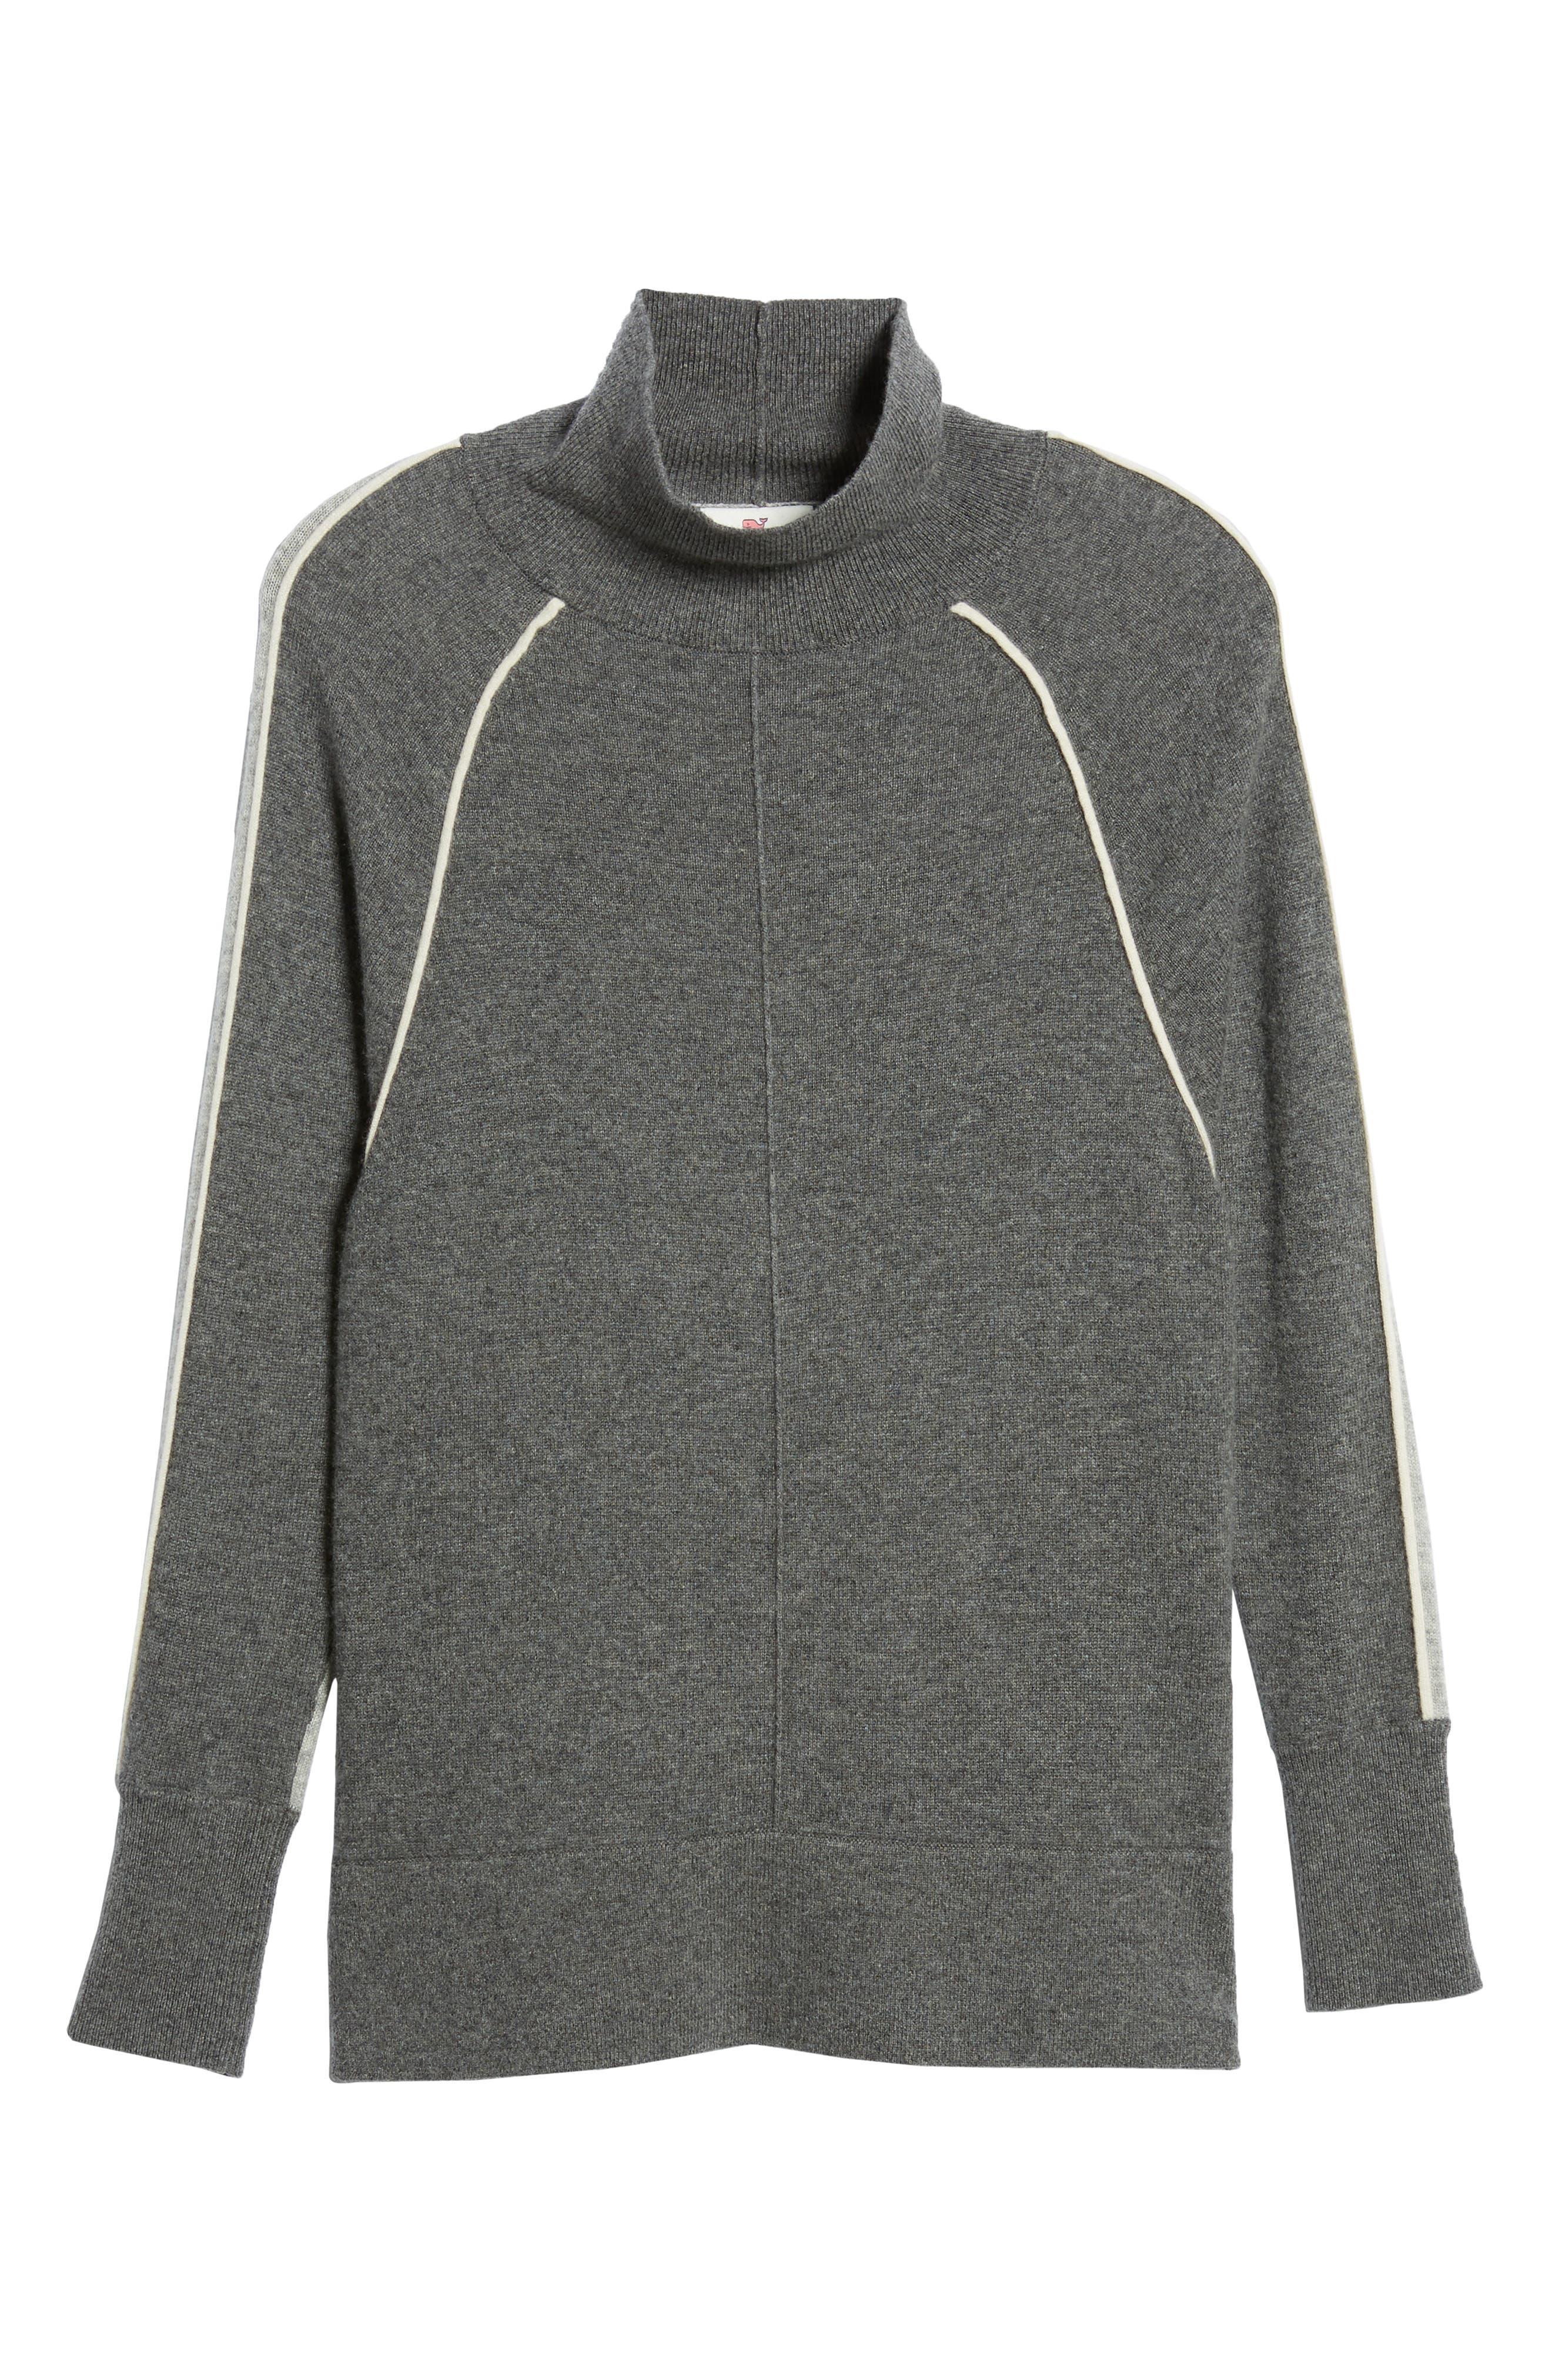 Raglan Sleeve Cashmere Turtleneck,                             Alternate thumbnail 6, color,                             061